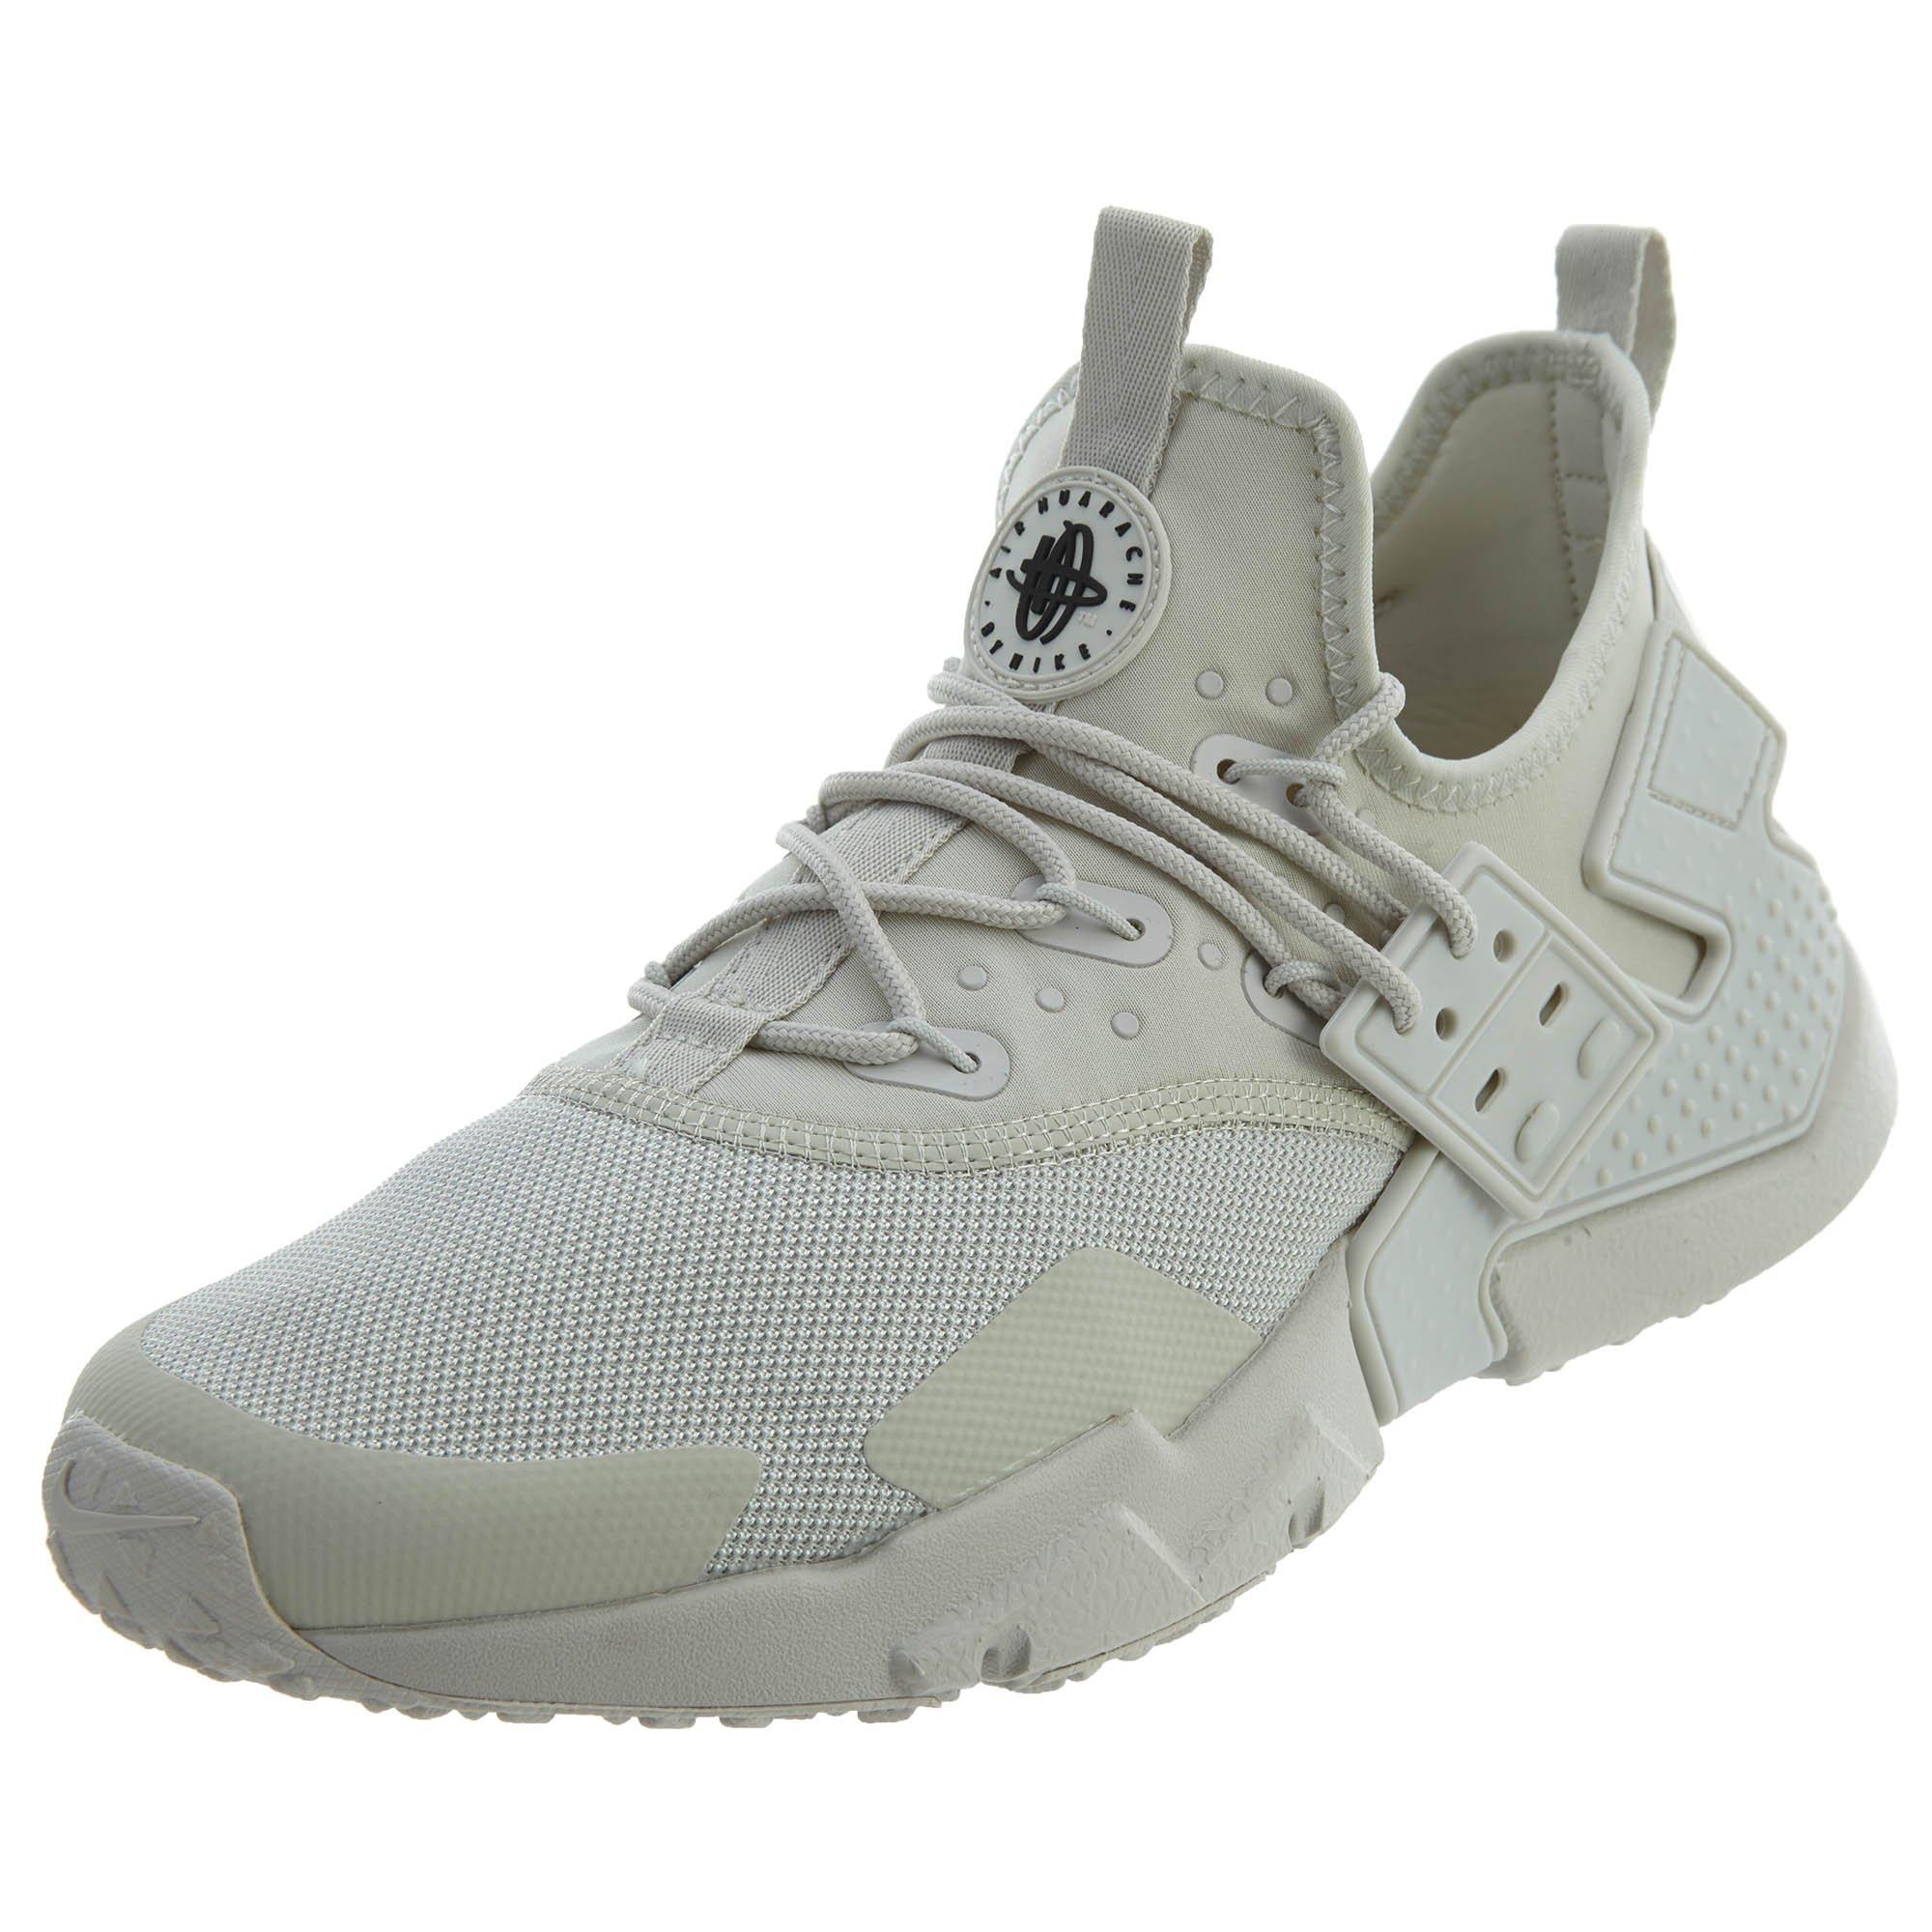 best service 8c1f6 815e5 Nike Air Huarache Drift Mens Shoes Light Bone/Black ah7334-001 (7.5 D(M) US)